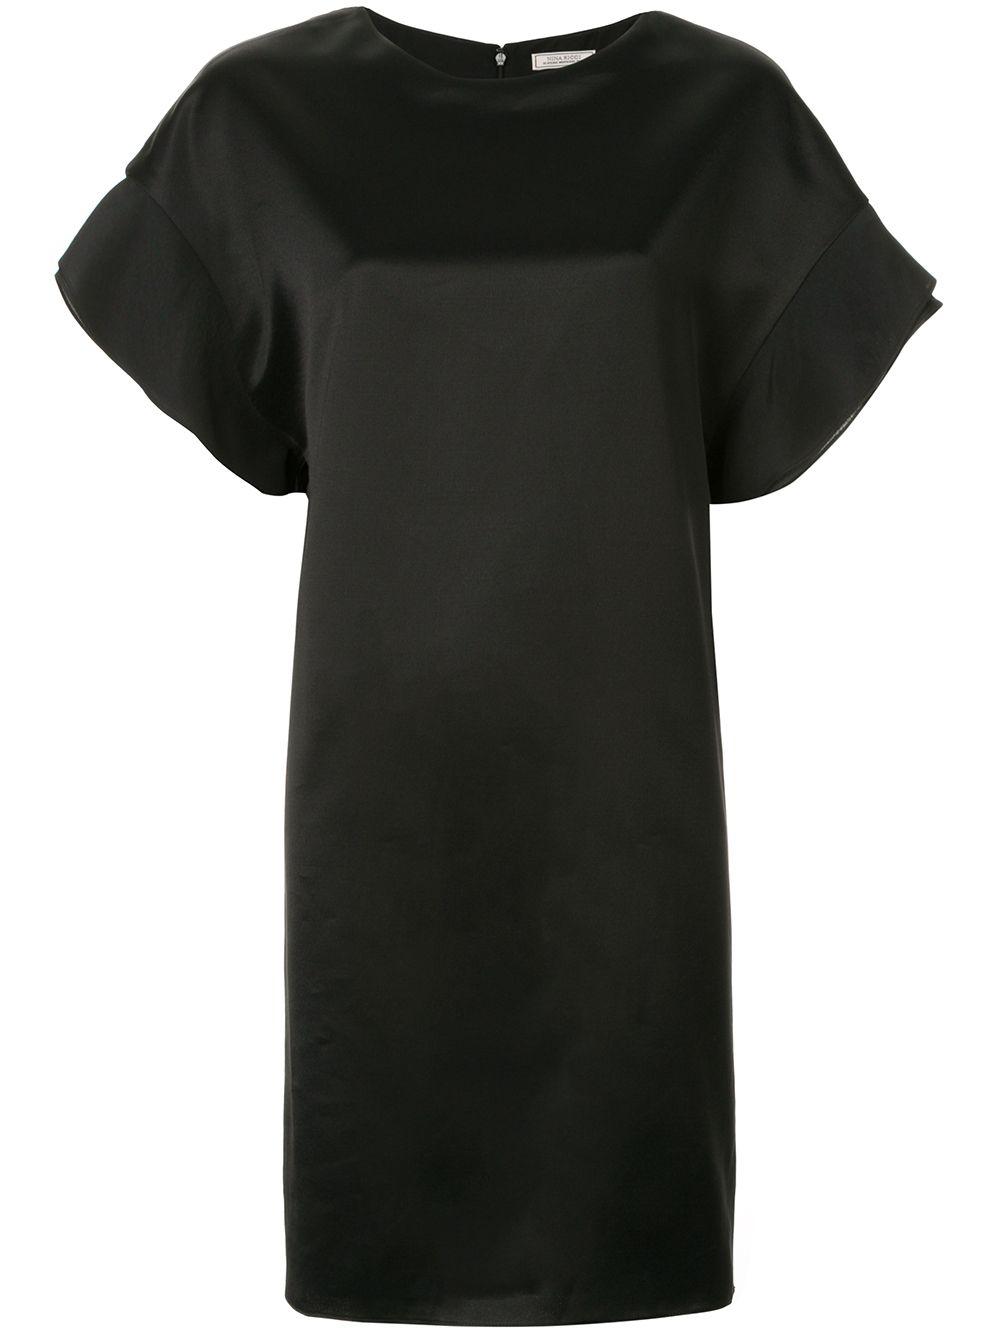 NINA RICCI | короткое платье-футболка | Clouty